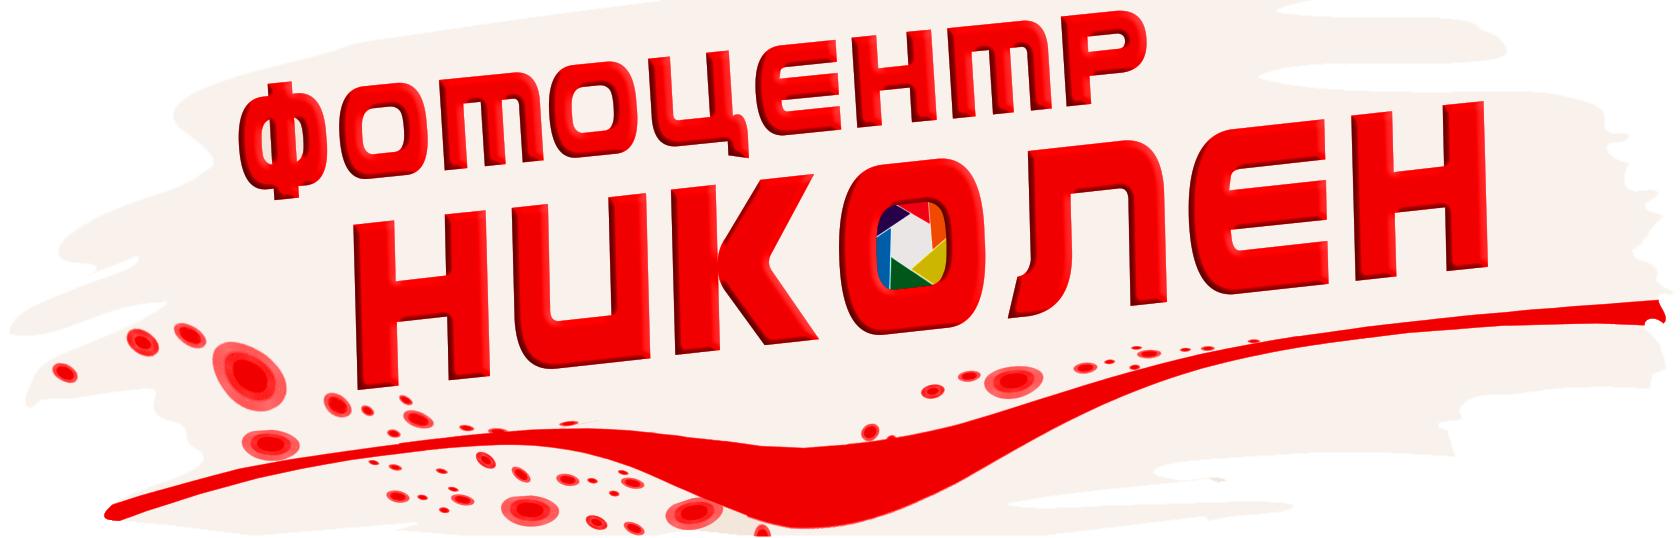 "Интернет магазин фотоцентр ""НИКОЛЕН"""